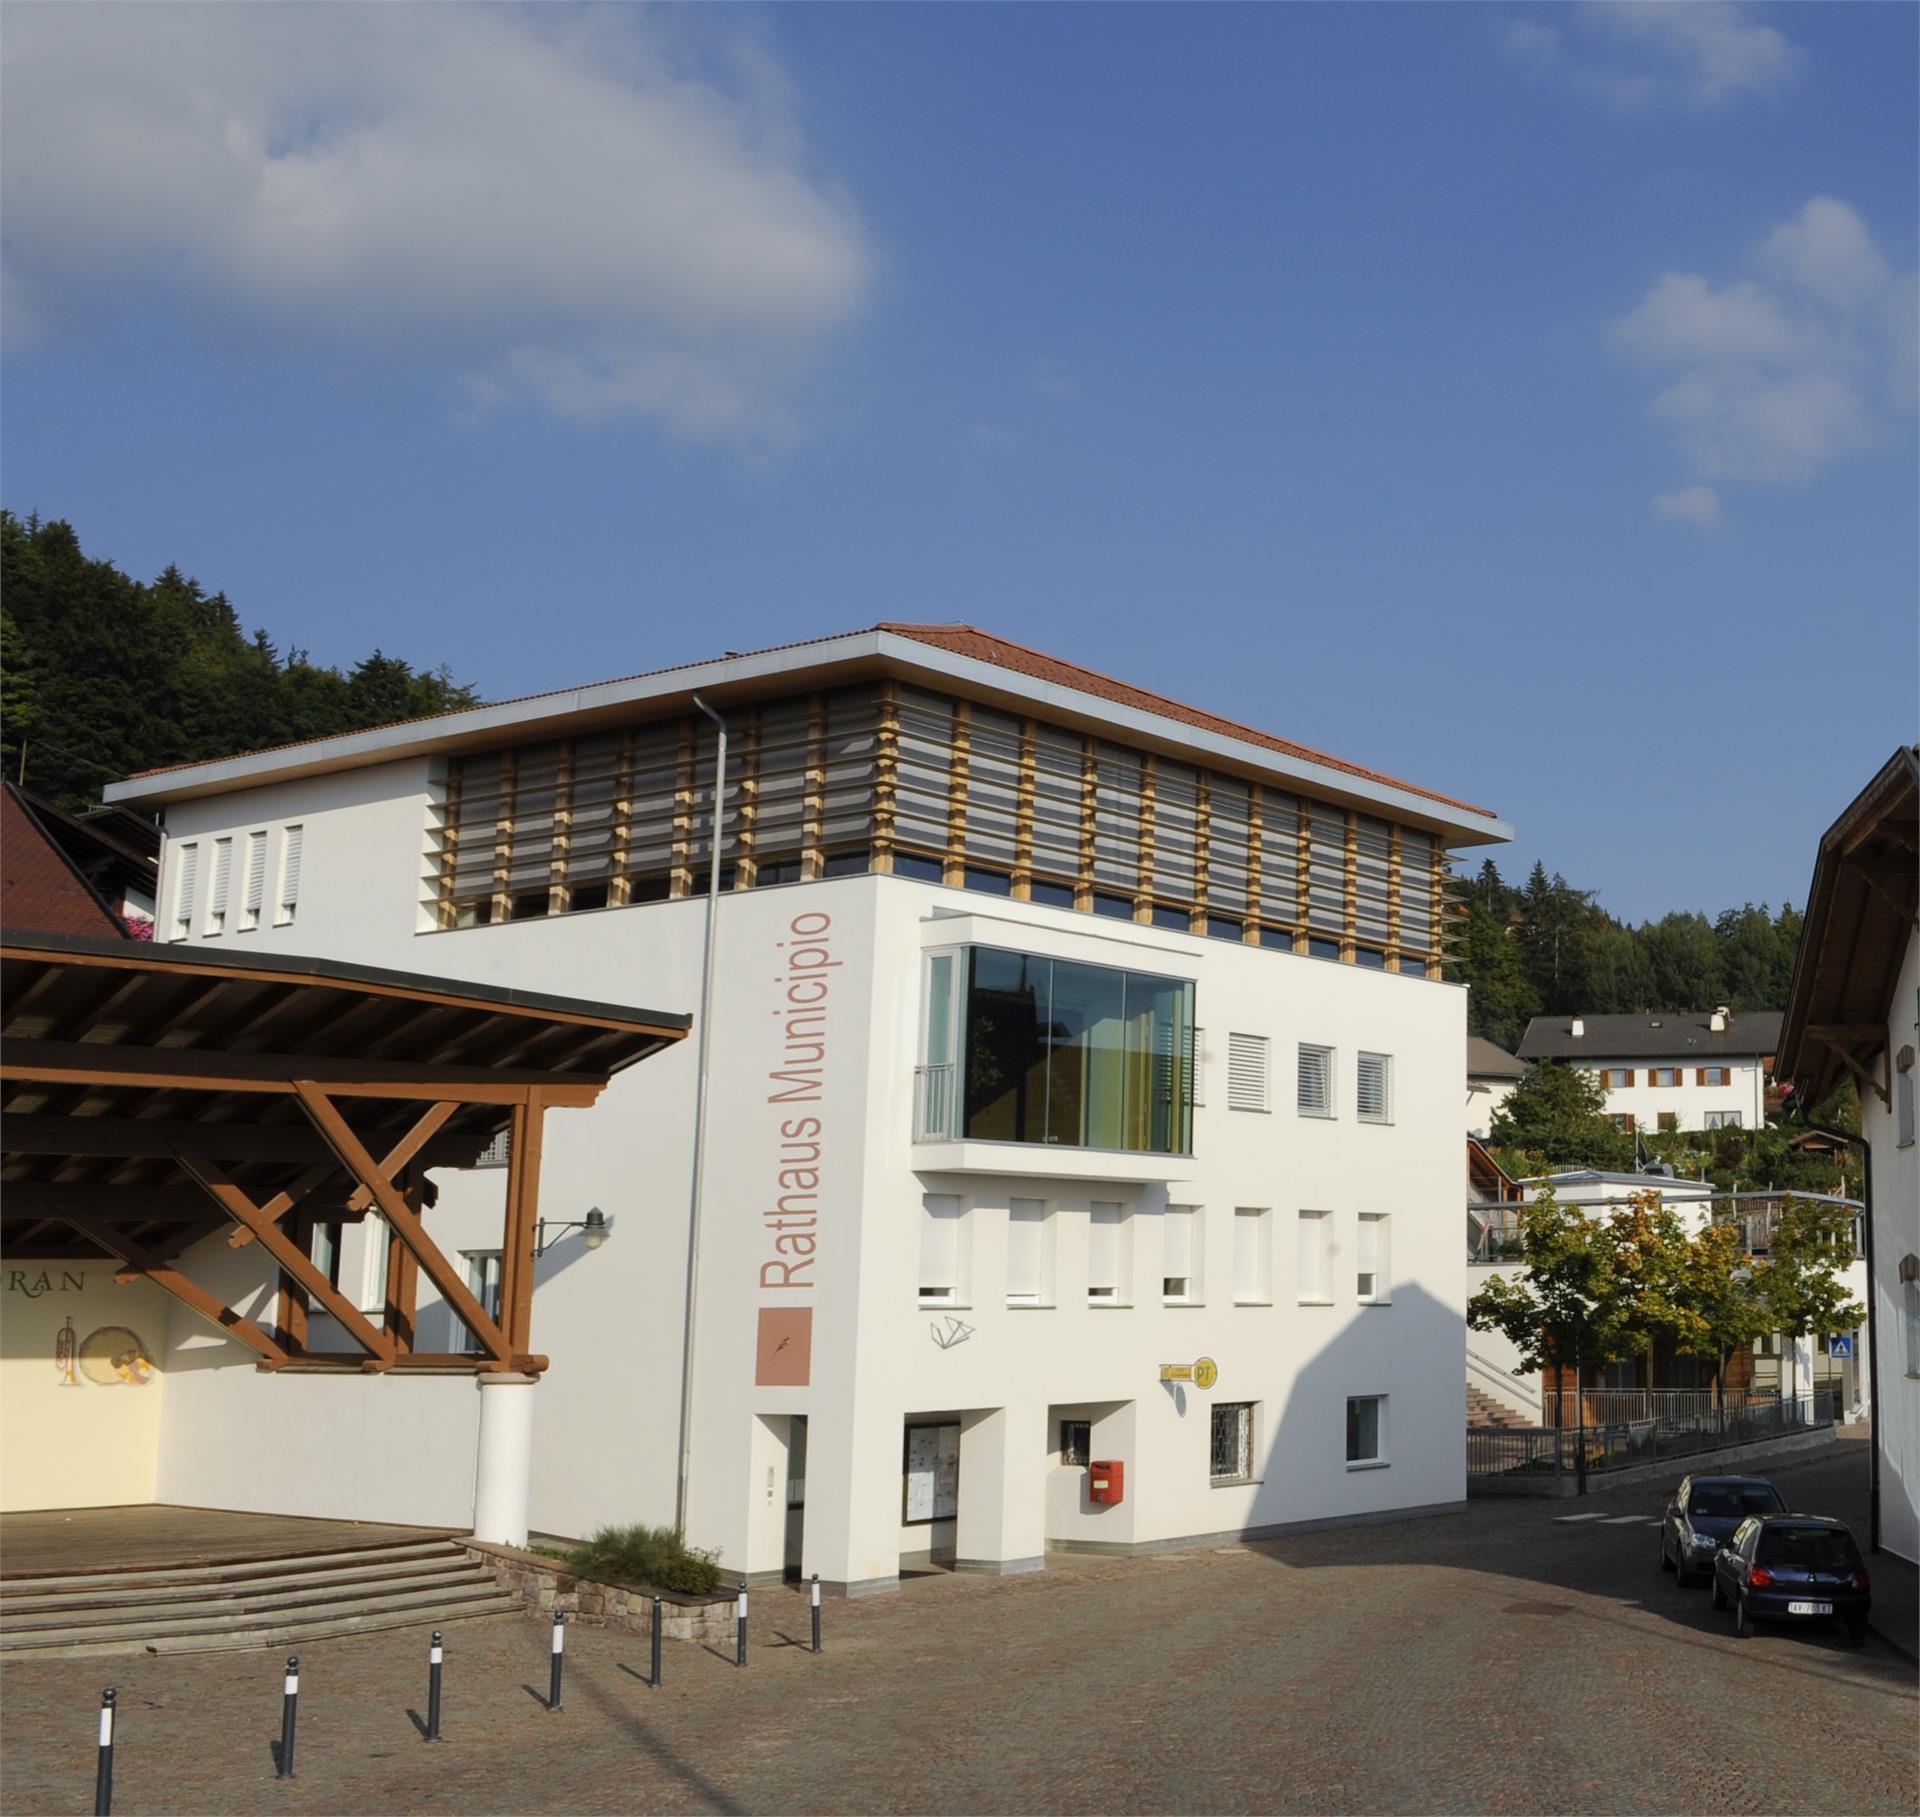 Library in Verano/Vöran